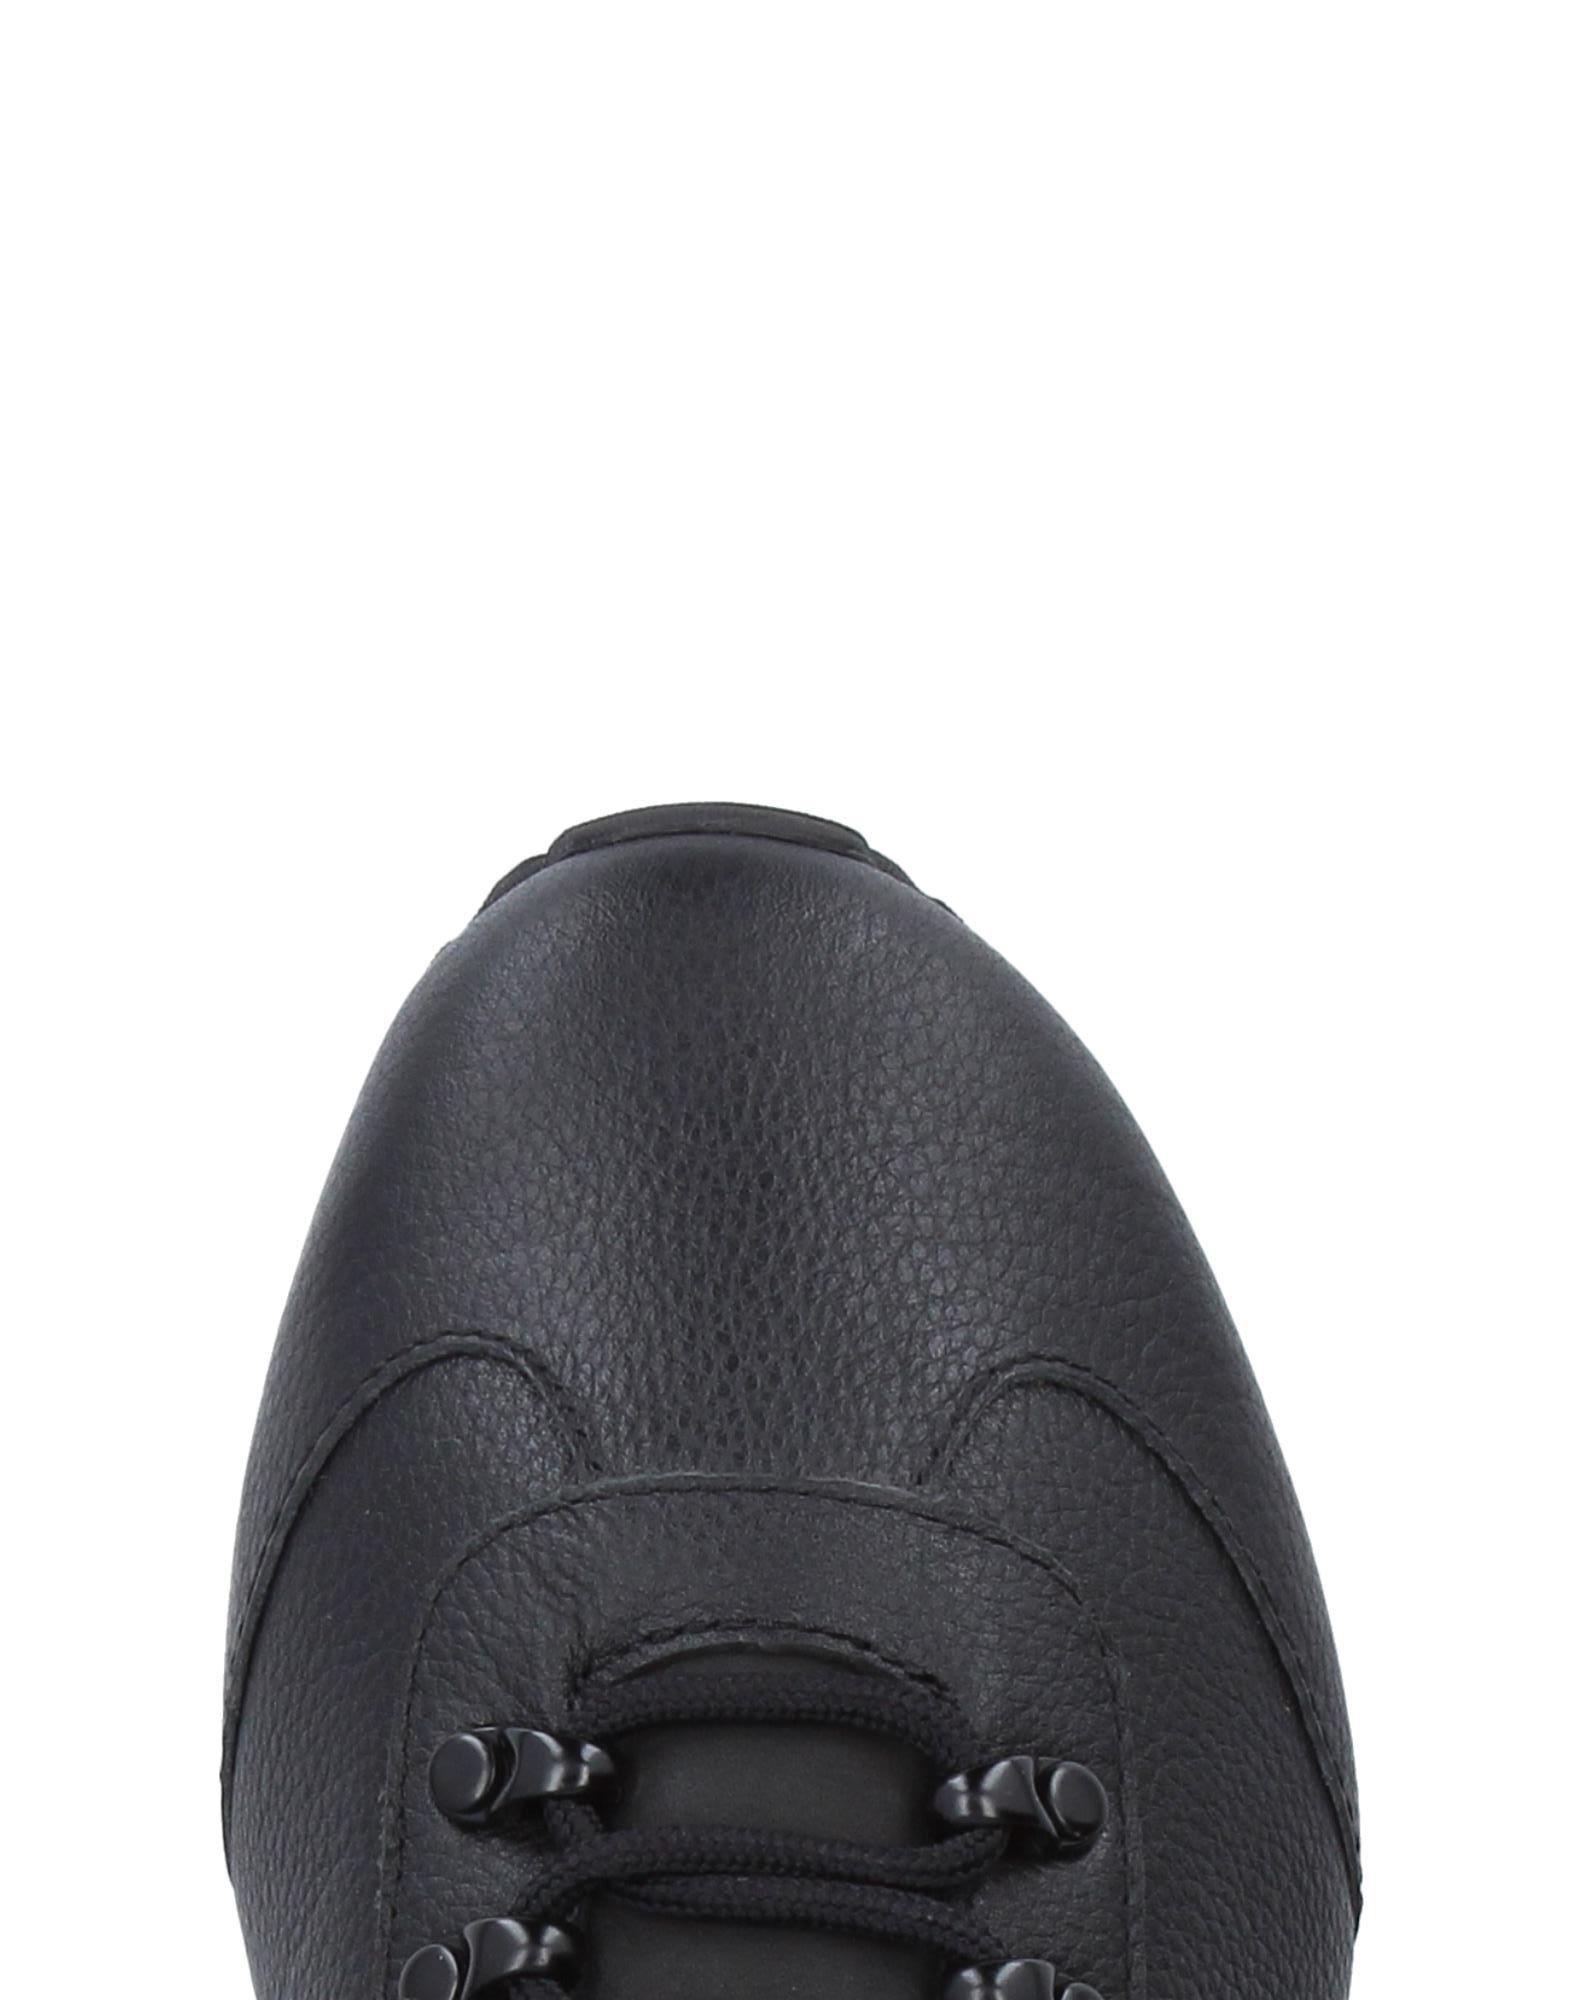 11355499VS Clae Sneakers Herren  11355499VS  Heiße Schuhe bd58dc